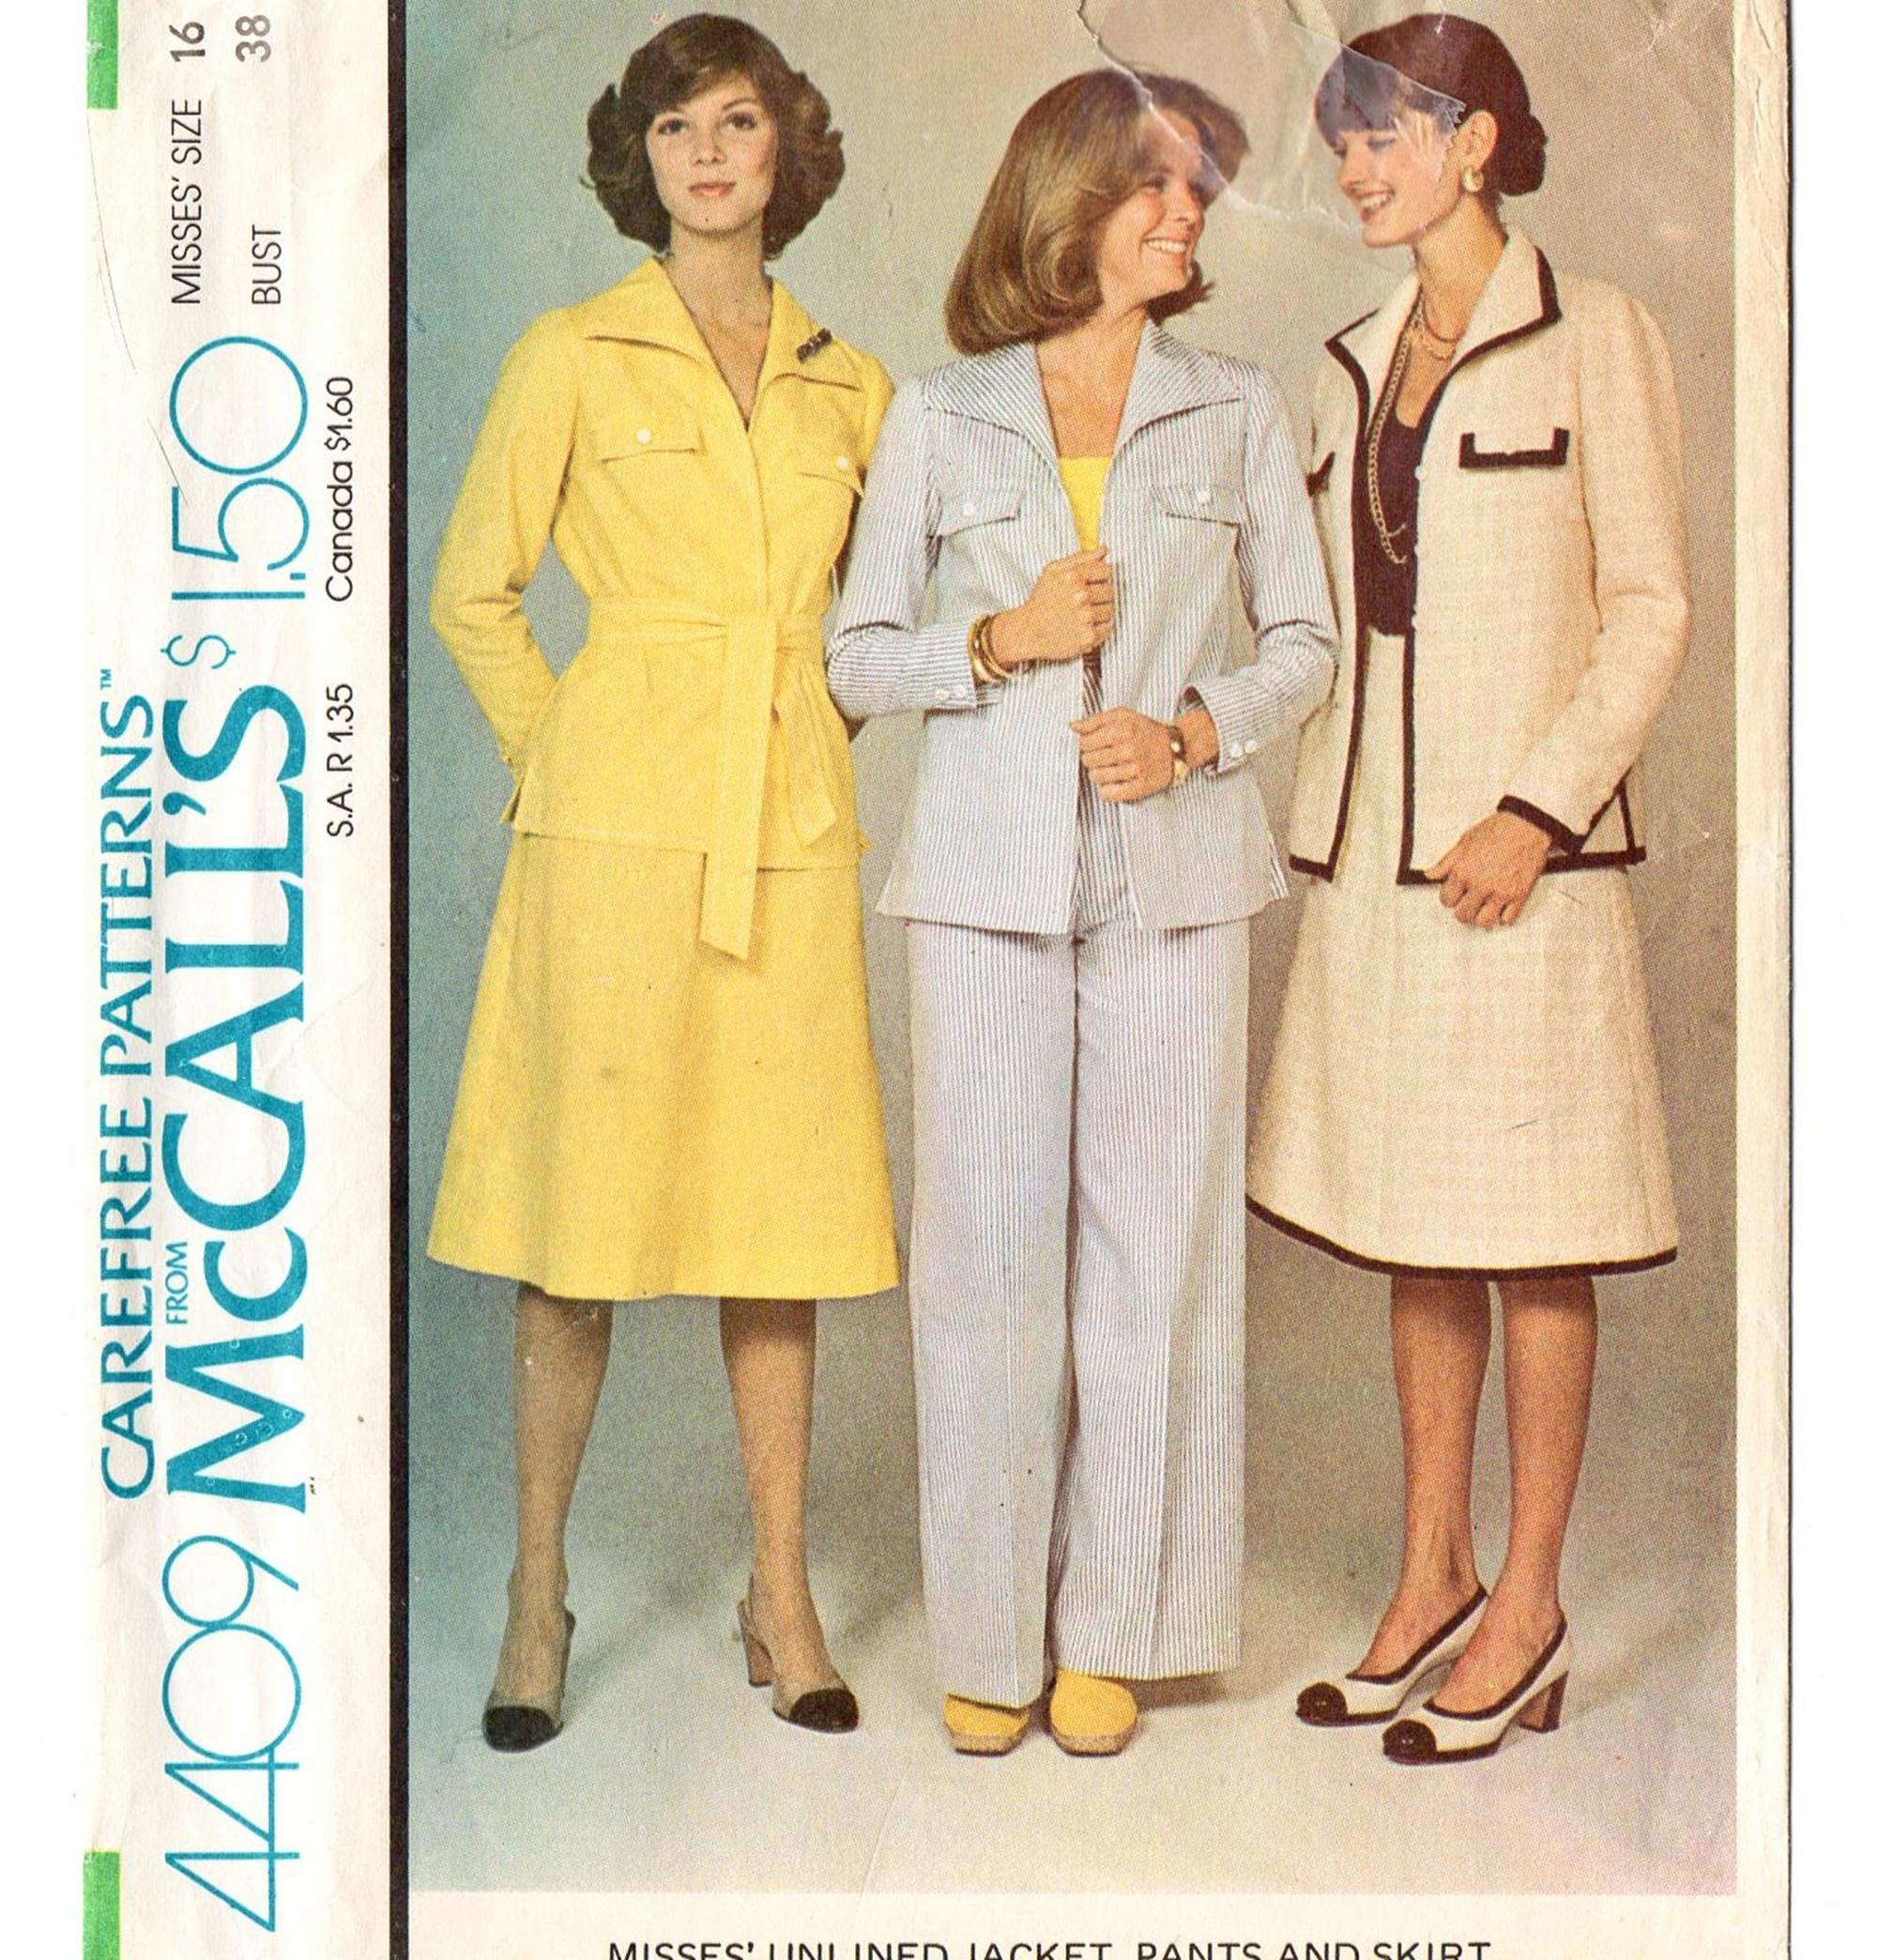 McCall's 4409 Misses Jacket, Pants, Skirt 70s Vintage Sewing Pattern Uncut Size